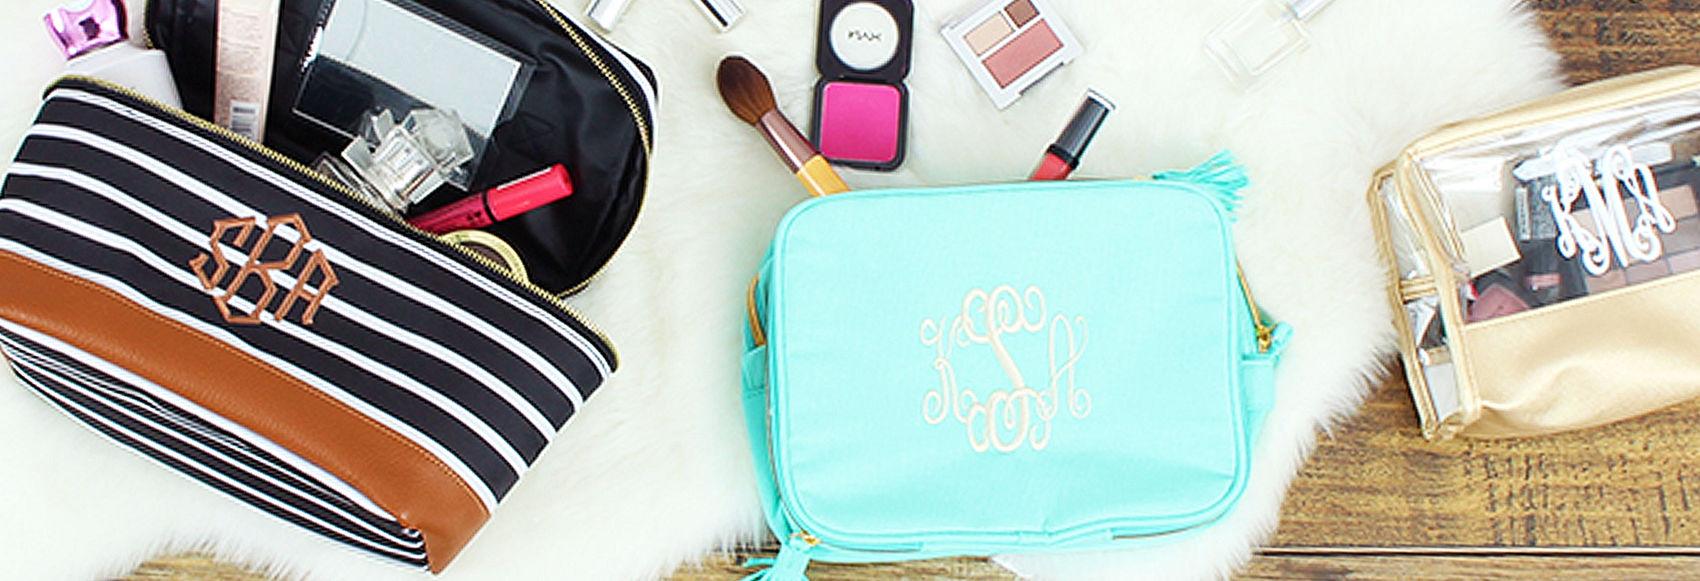 Cosmetics + Toiletry Bags